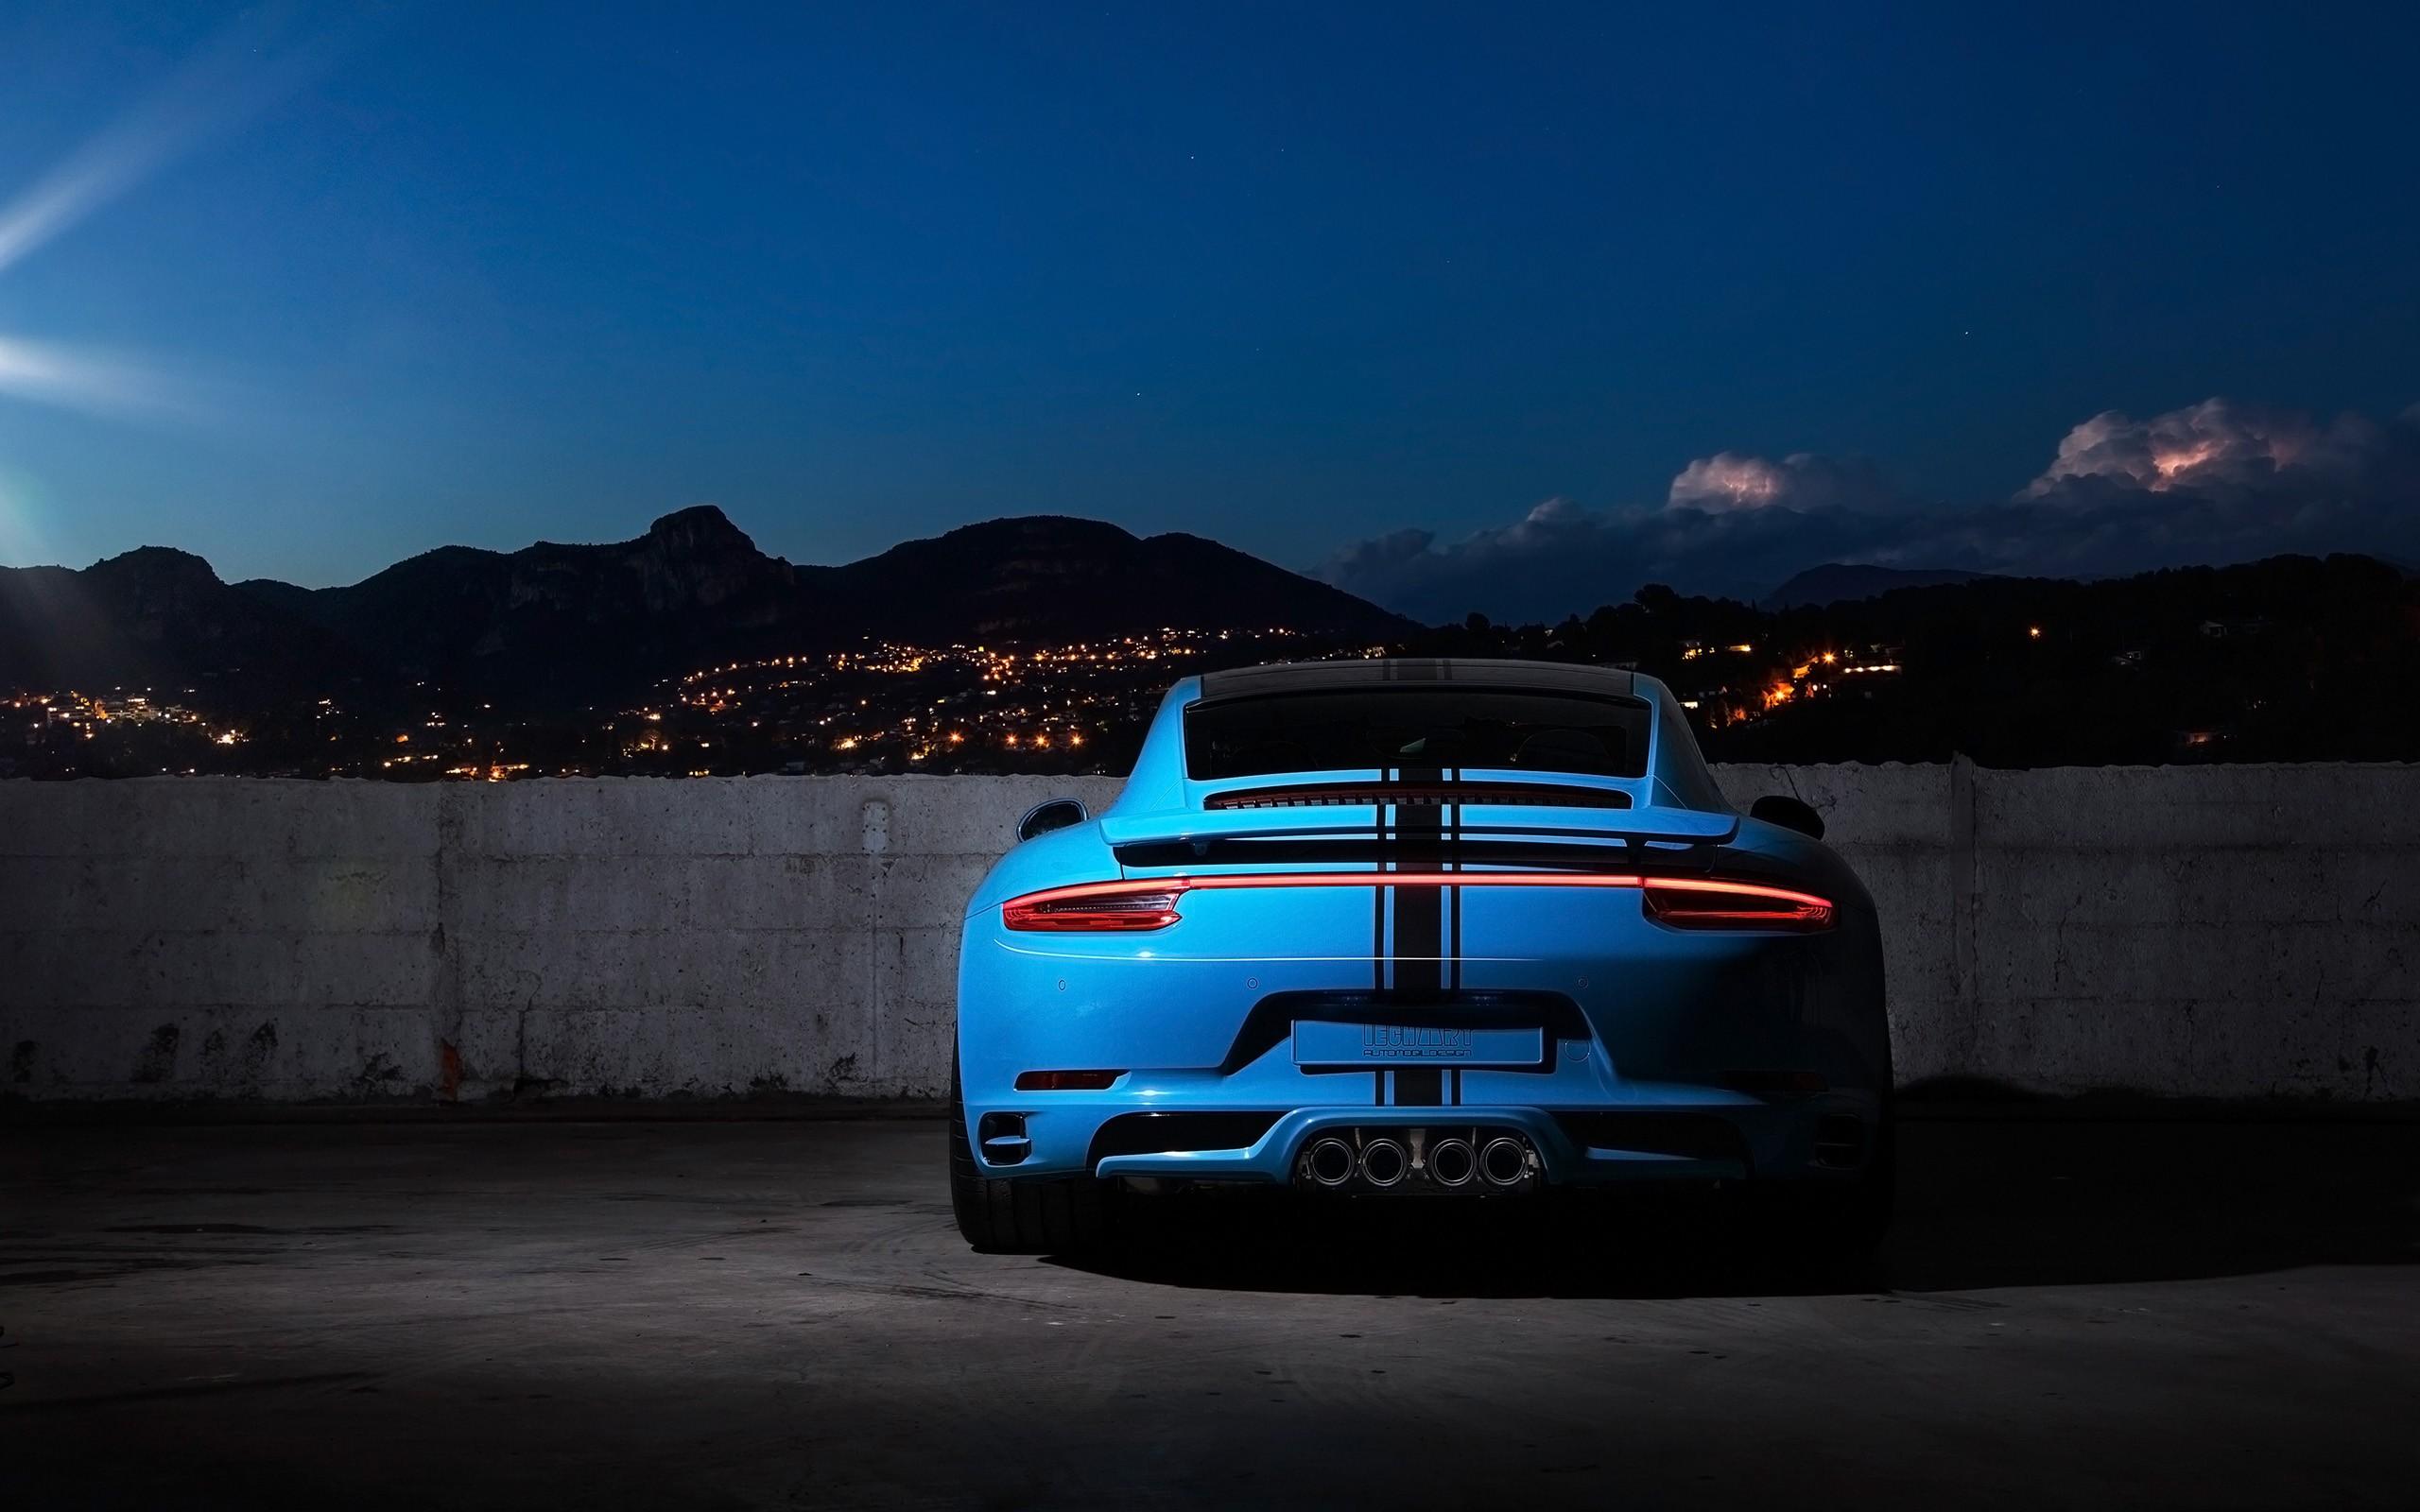 Audi Car Full Hd Wallpaper Download 2016 Techart Porsche 911 Coupe 2 Wallpaper Hd Car